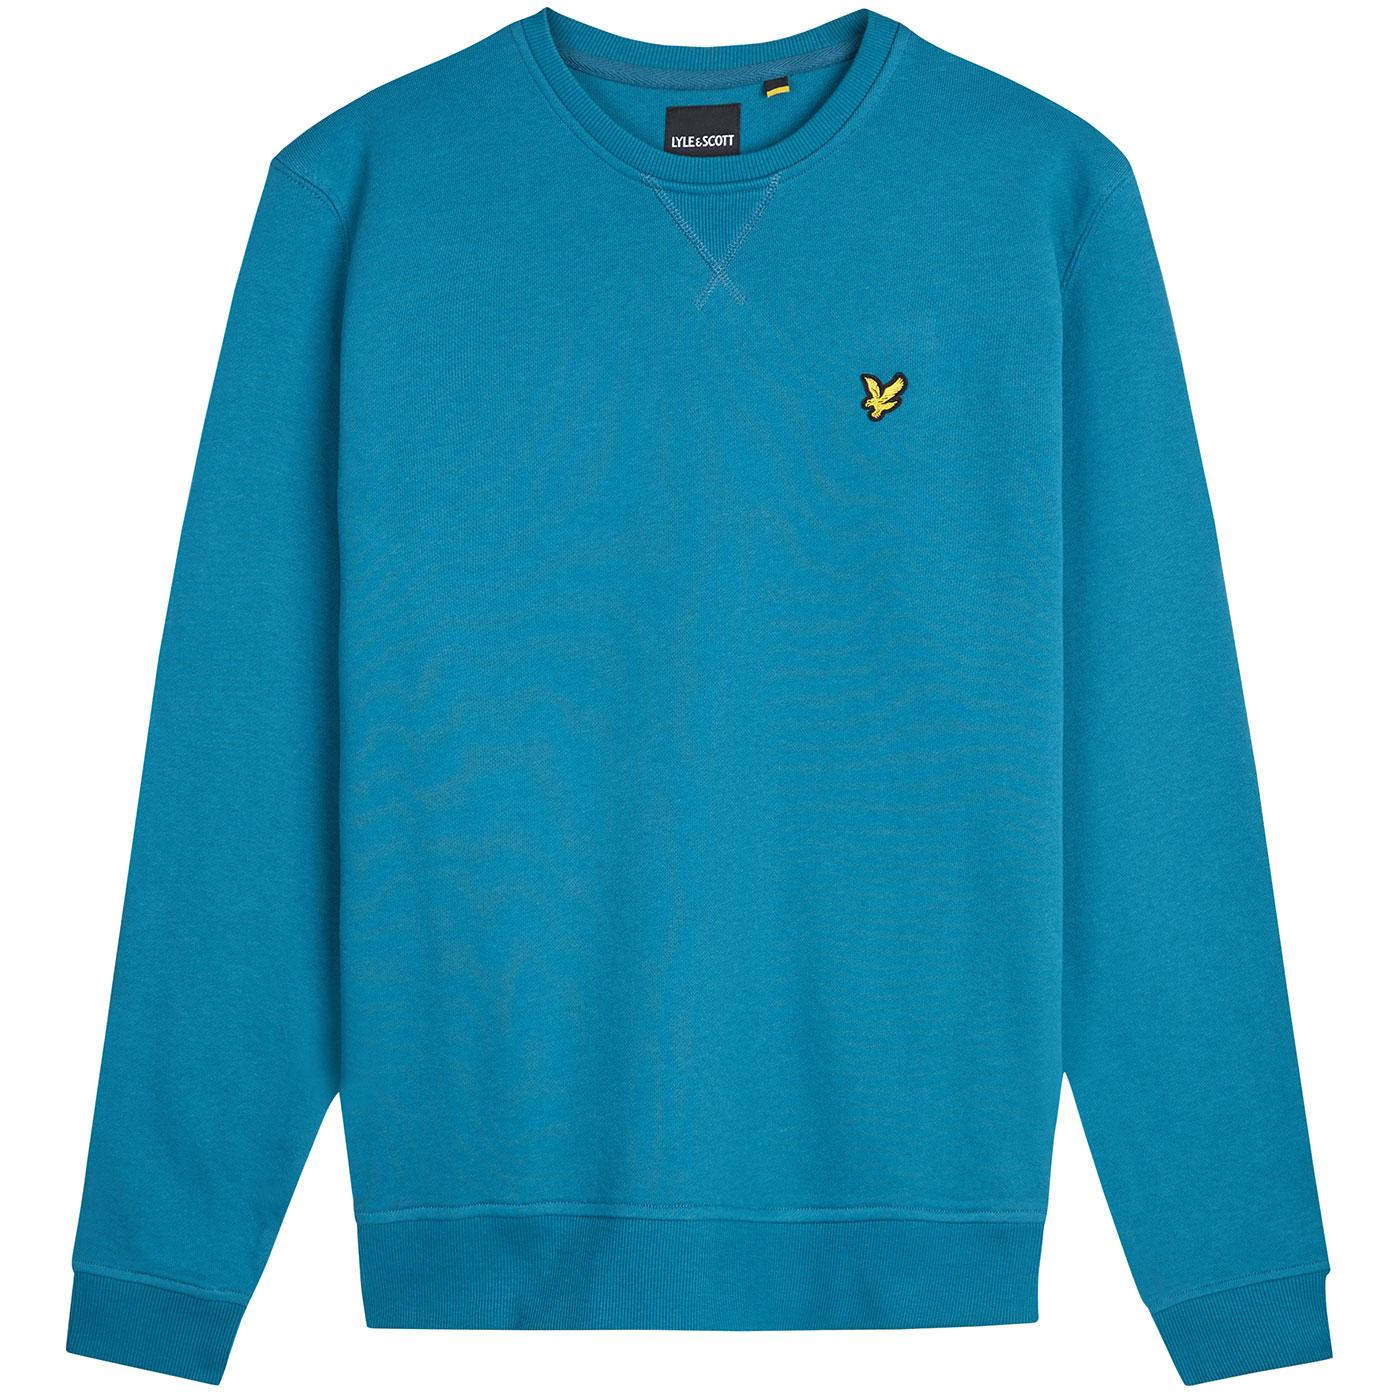 LYLE & SCOTT Mod Crew Neck Sweatshirt PETROL TEAL